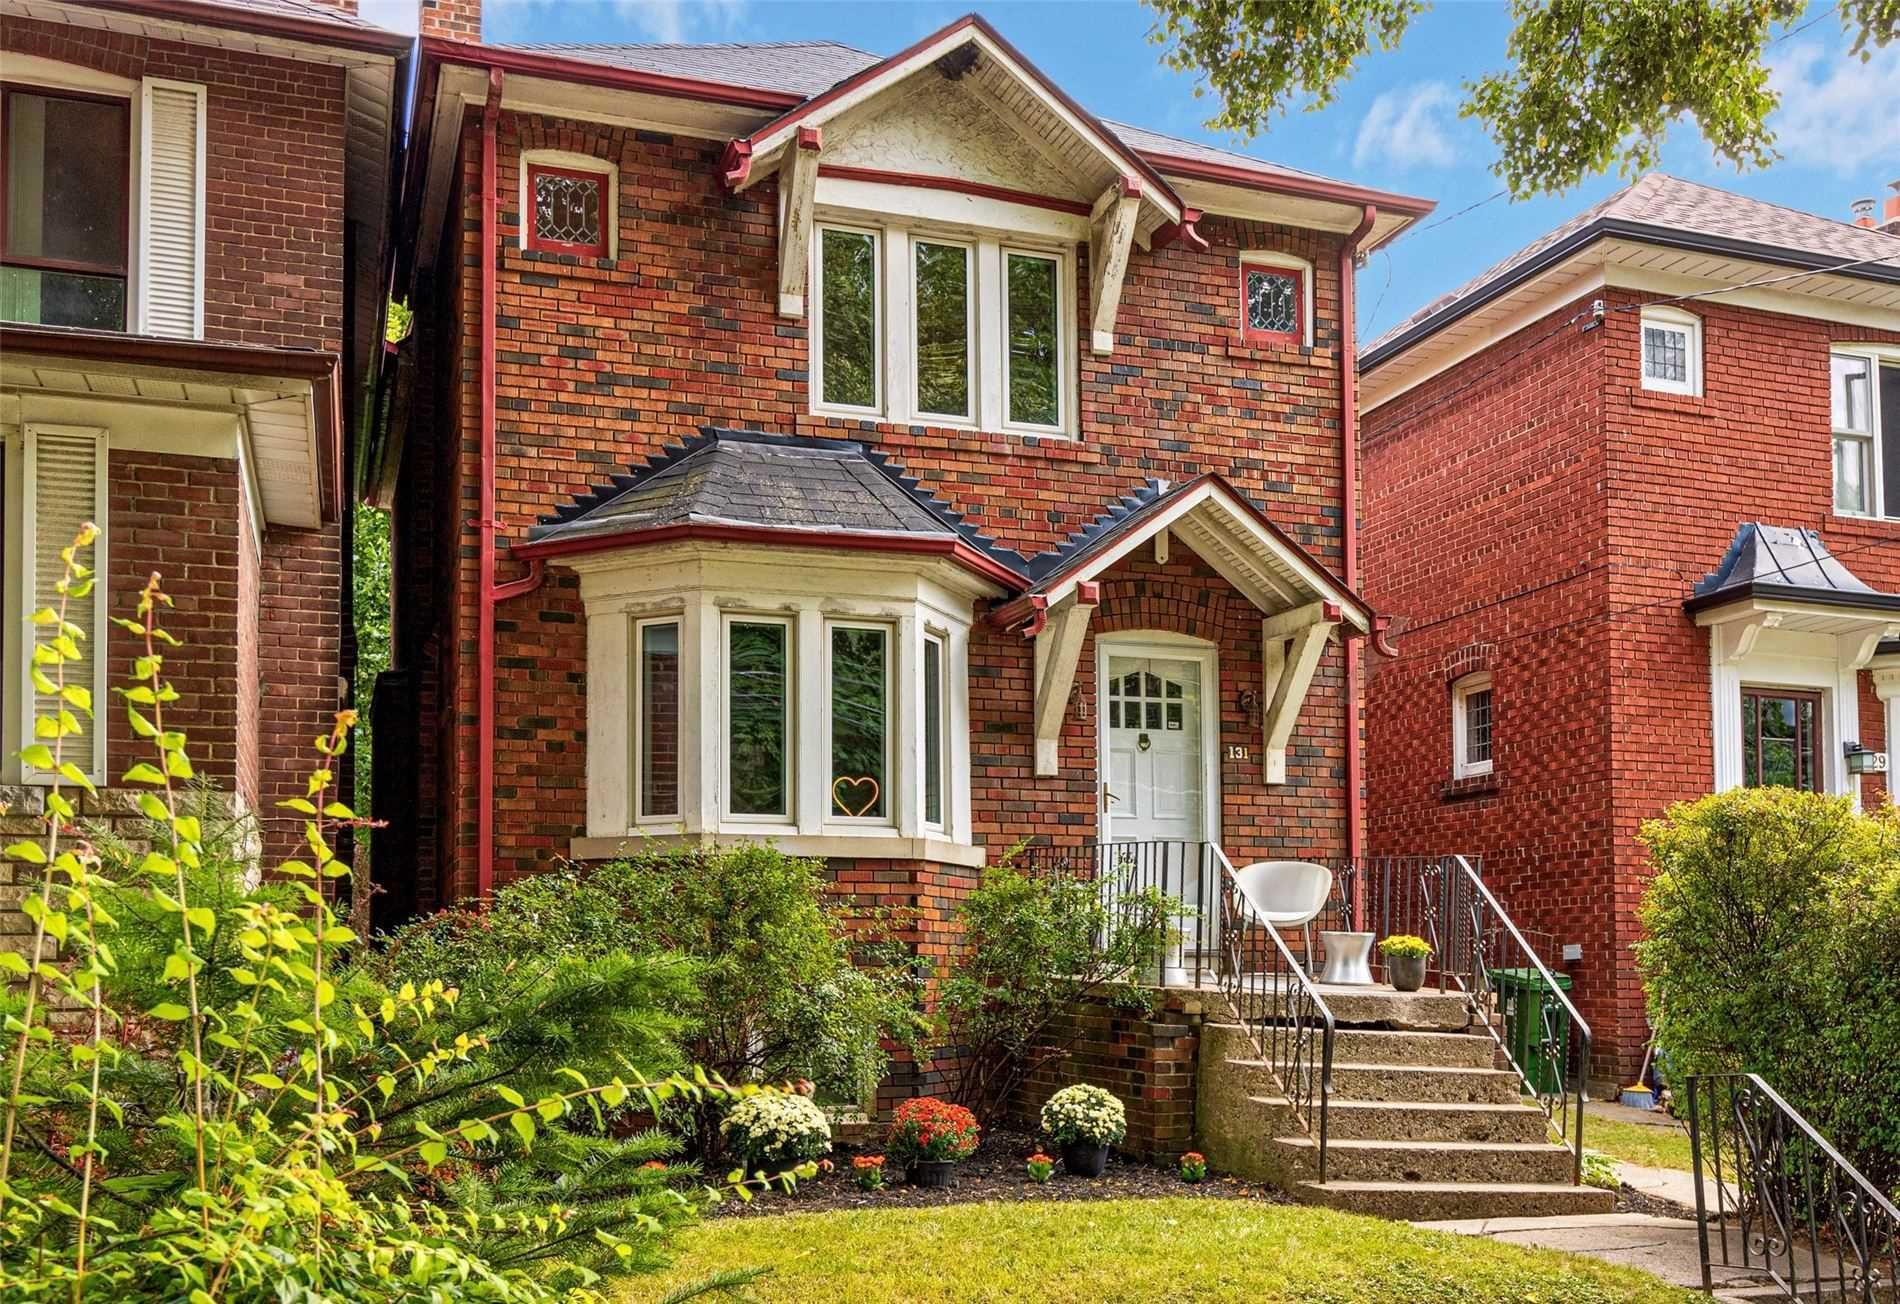 Main Photo: 131 E Hillsdale Avenue in Toronto: Mount Pleasant East House (2-Storey) for sale (Toronto C10)  : MLS®# C5376173